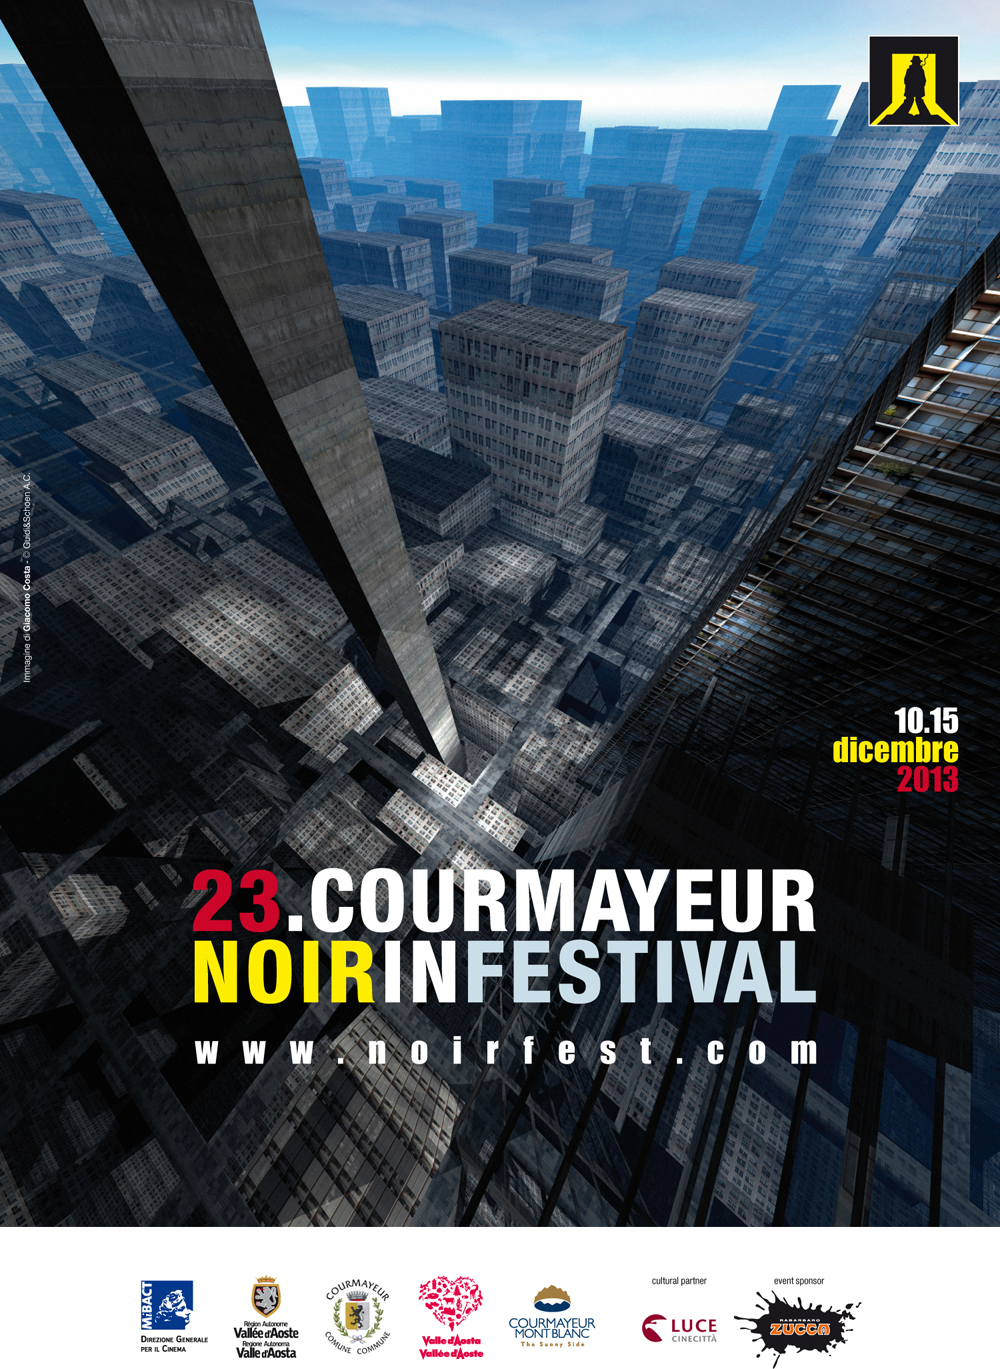 Courmayeur Noir In Festival 2013